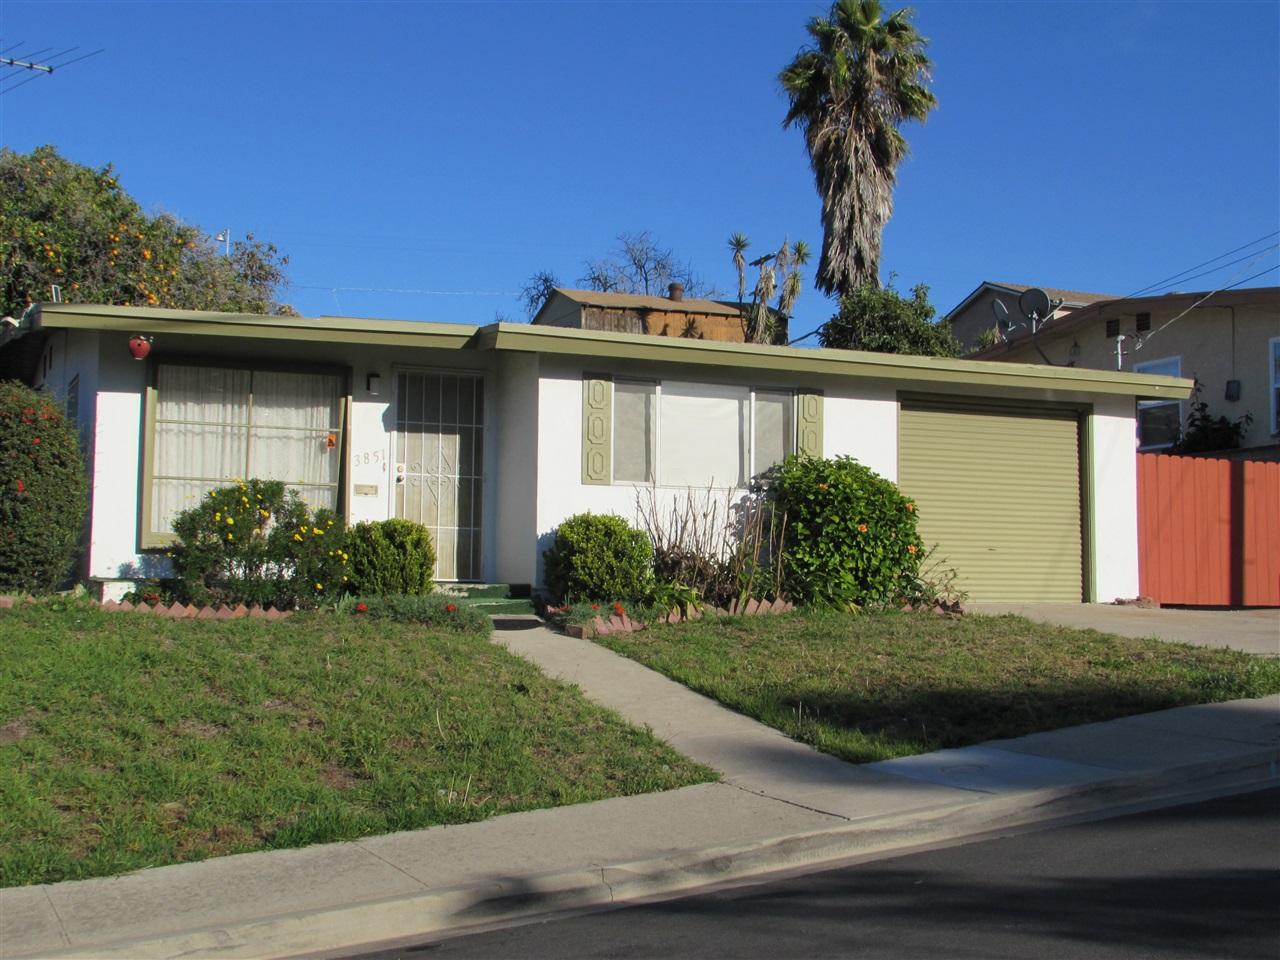 3851 Gayle St, San Diego, CA